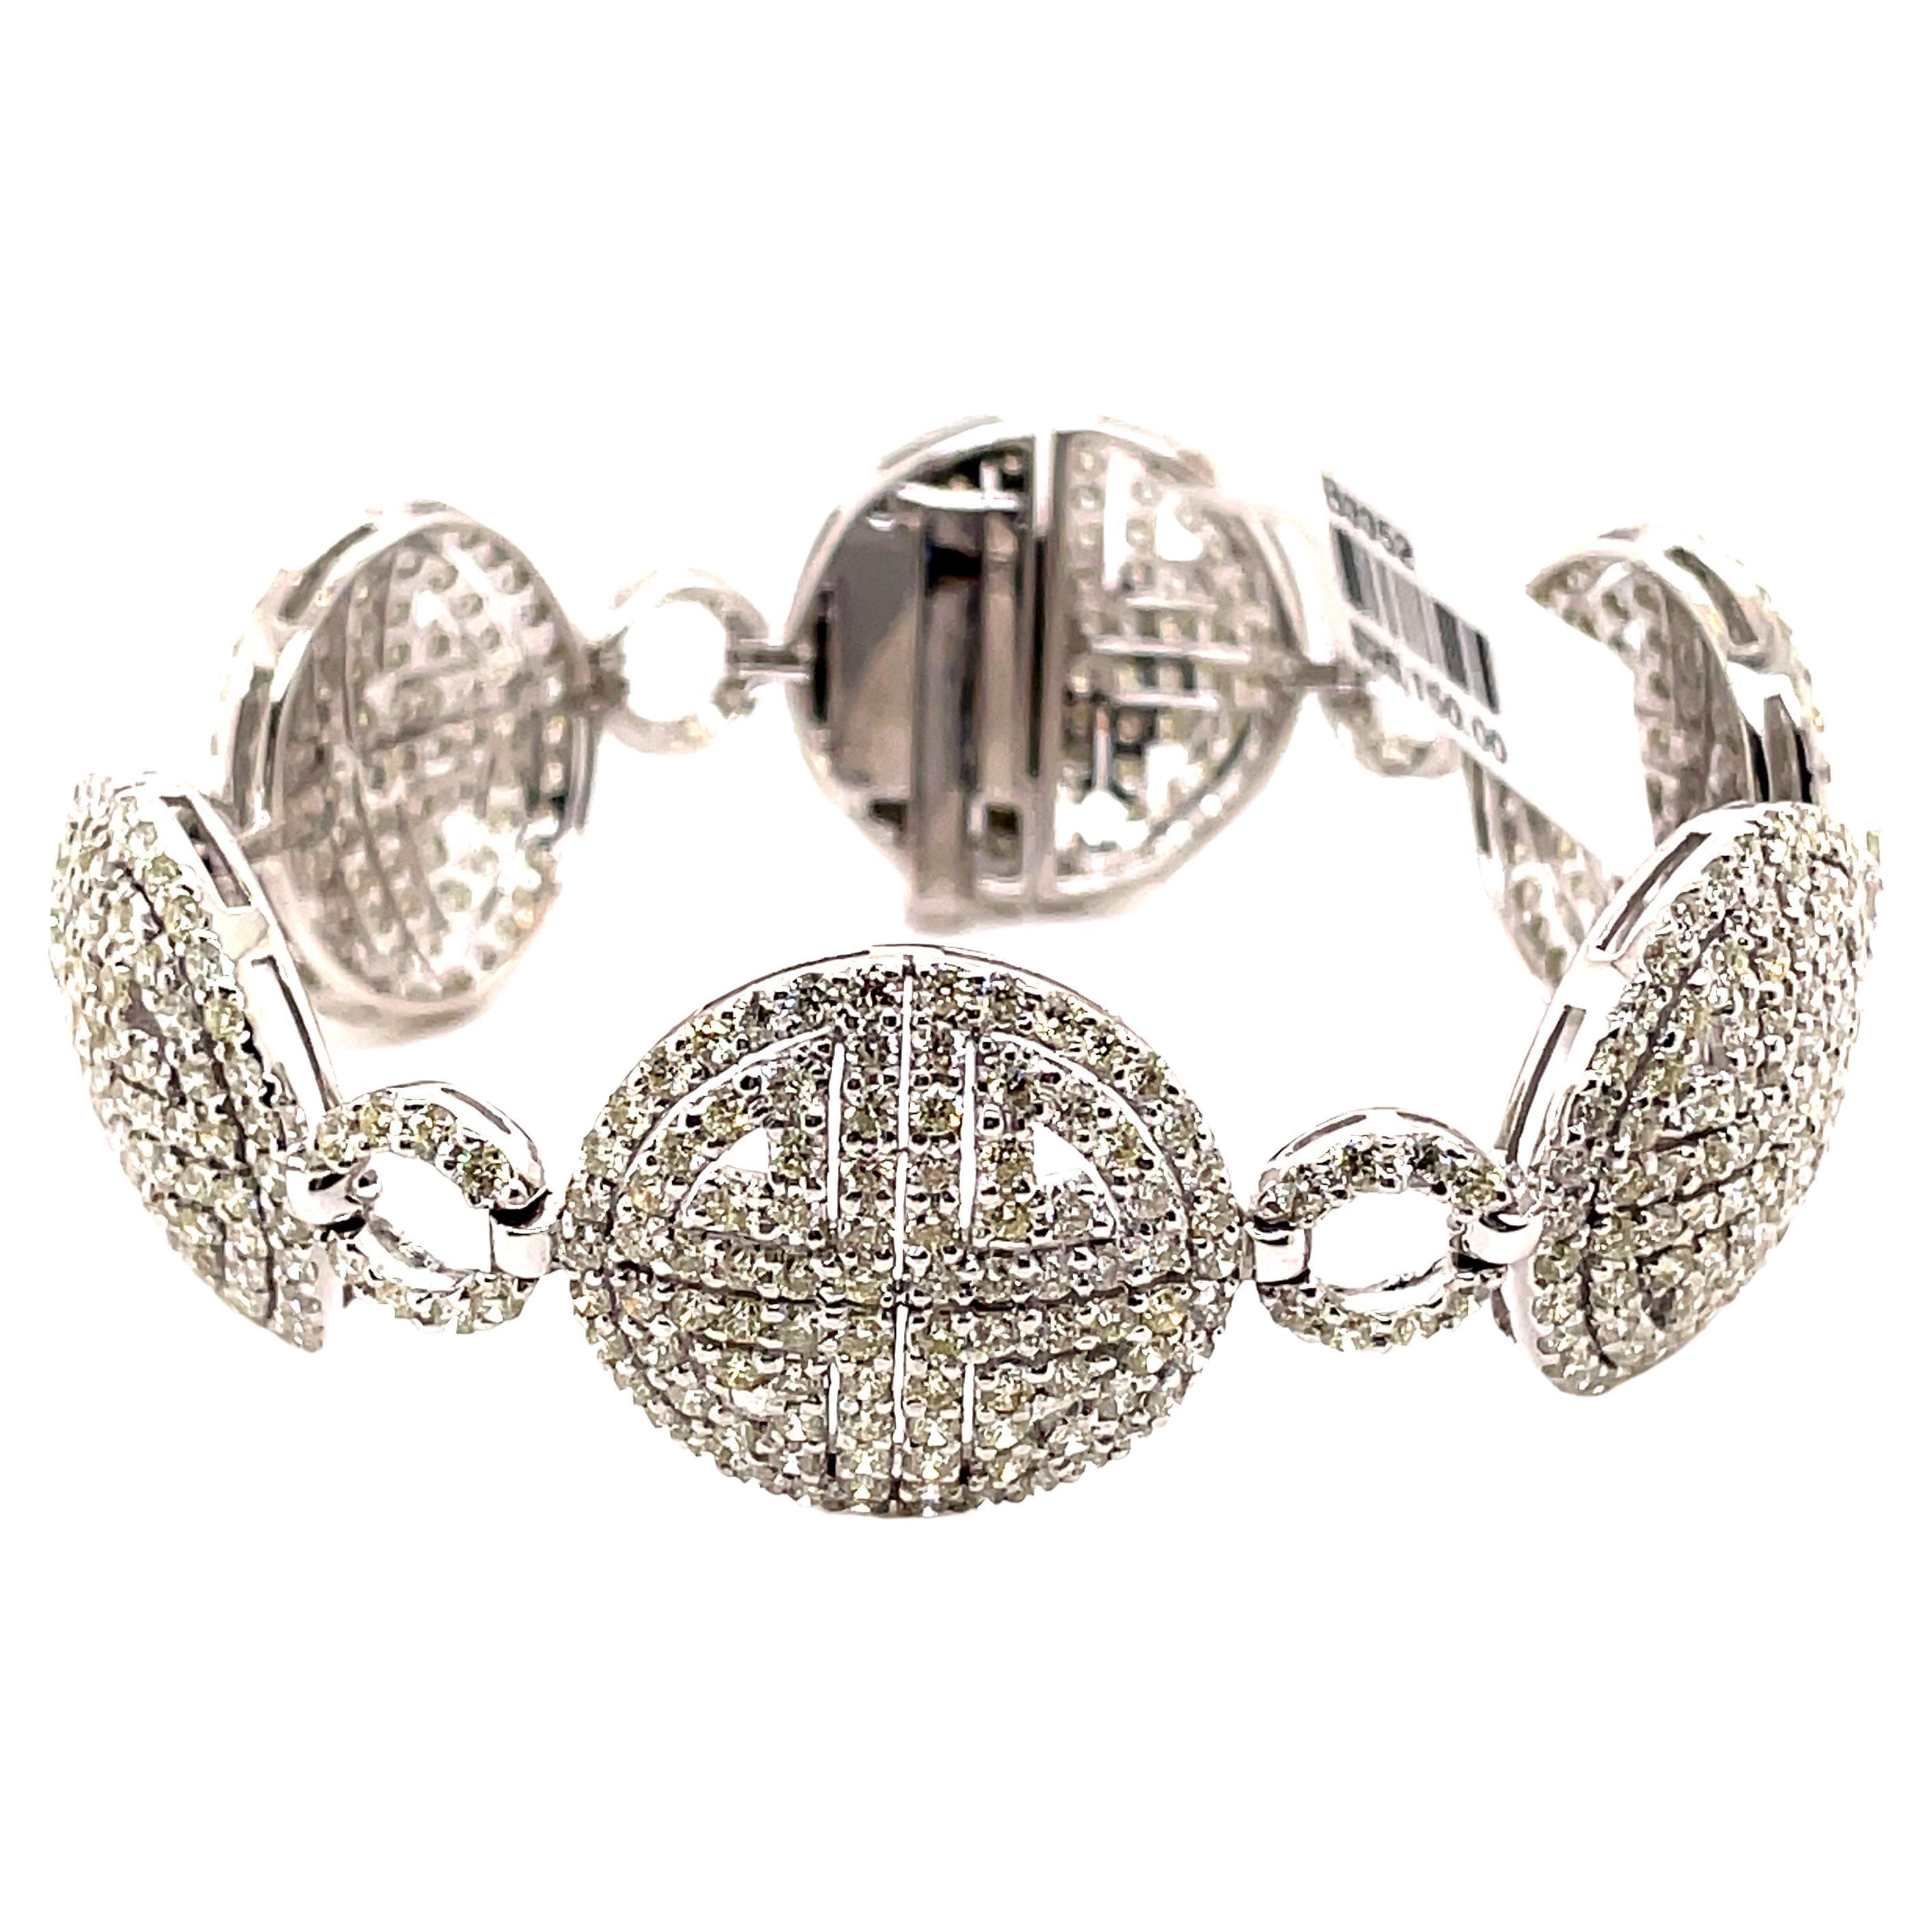 11.20ct Diamond Bracelet 18k White Gold